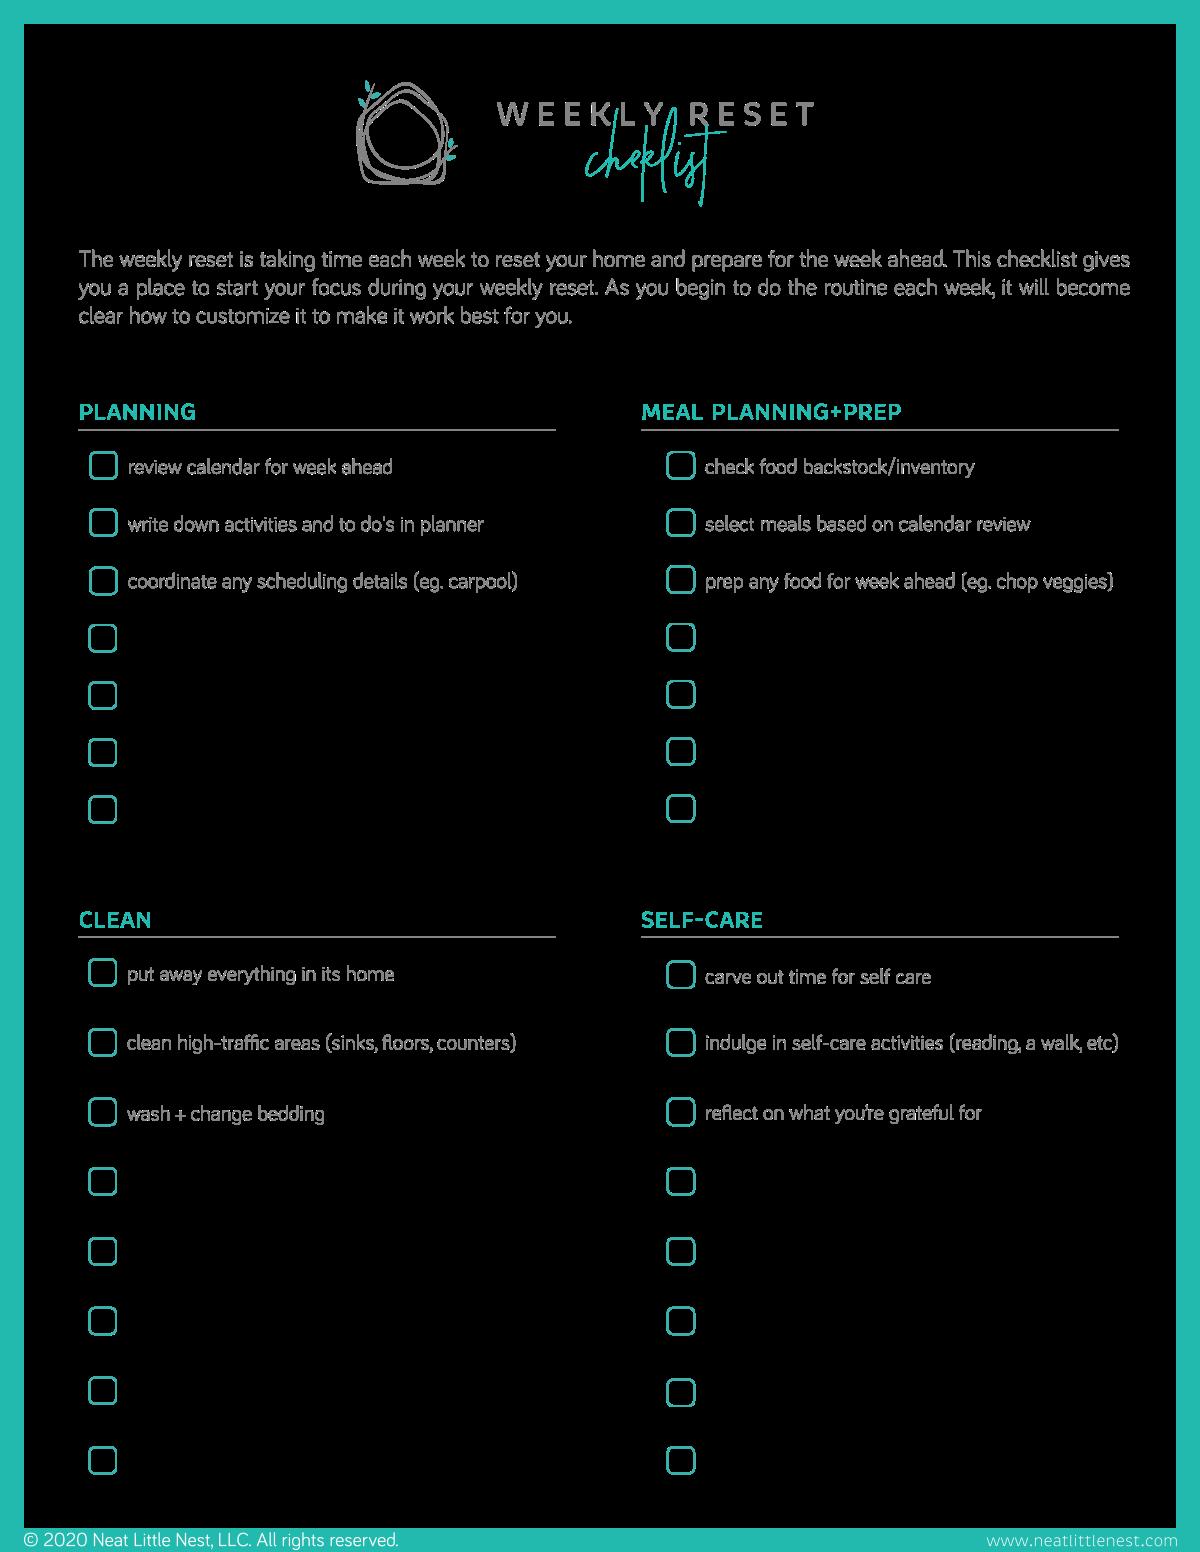 Weekly Reset Checklist